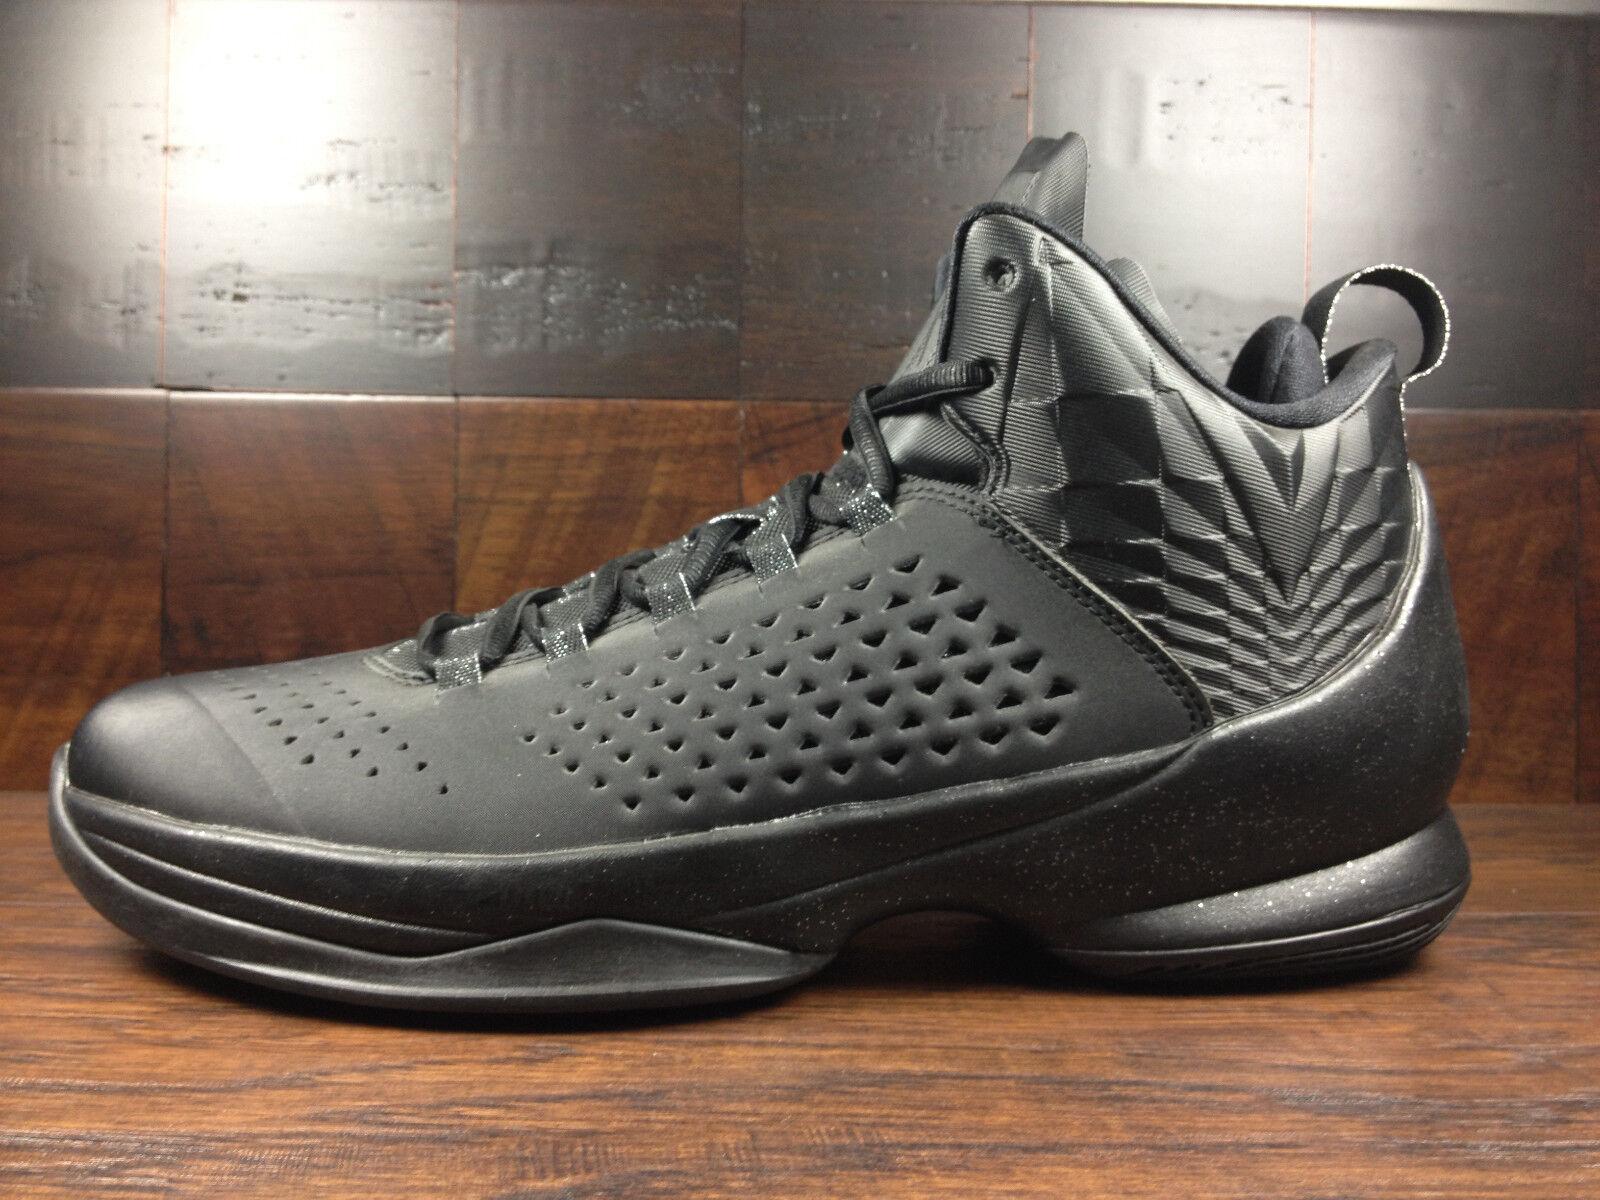 sports shoes 64841 b6649 ... italy air carmelo jordan melo m11 precio reducción reducción de precios  carmelo air baloncesto hombre casual